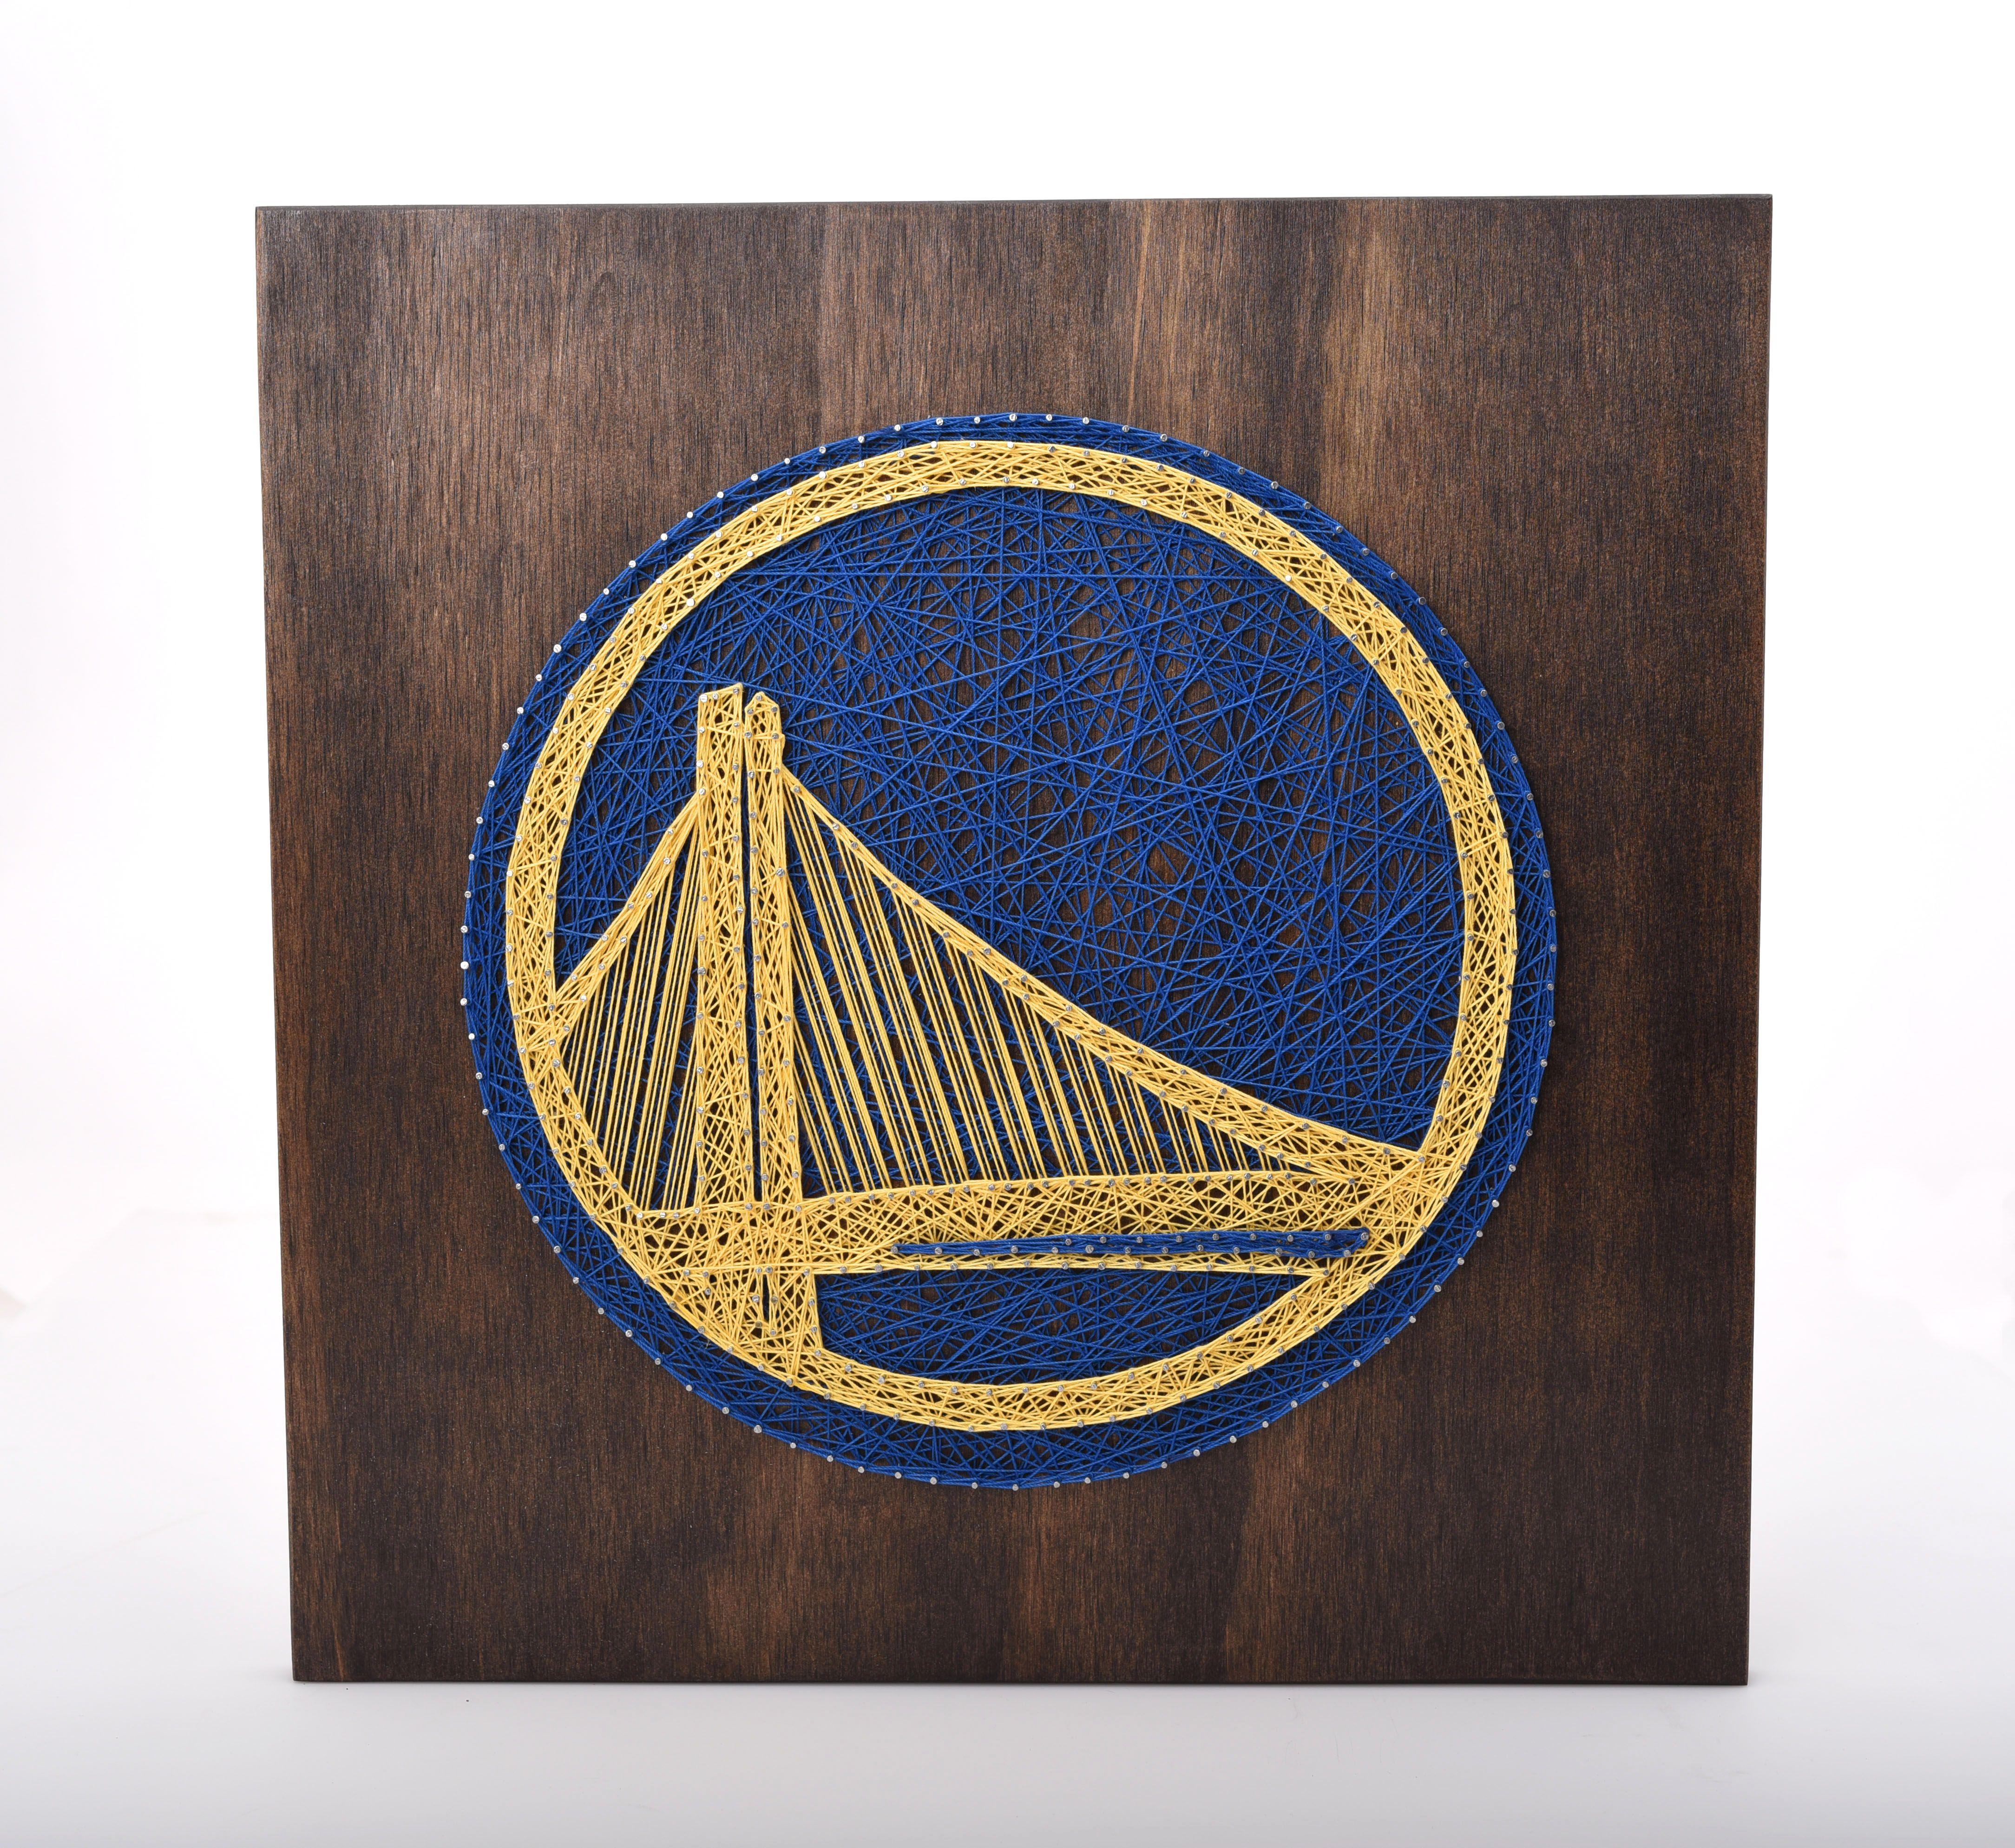 Golden state warriors string art